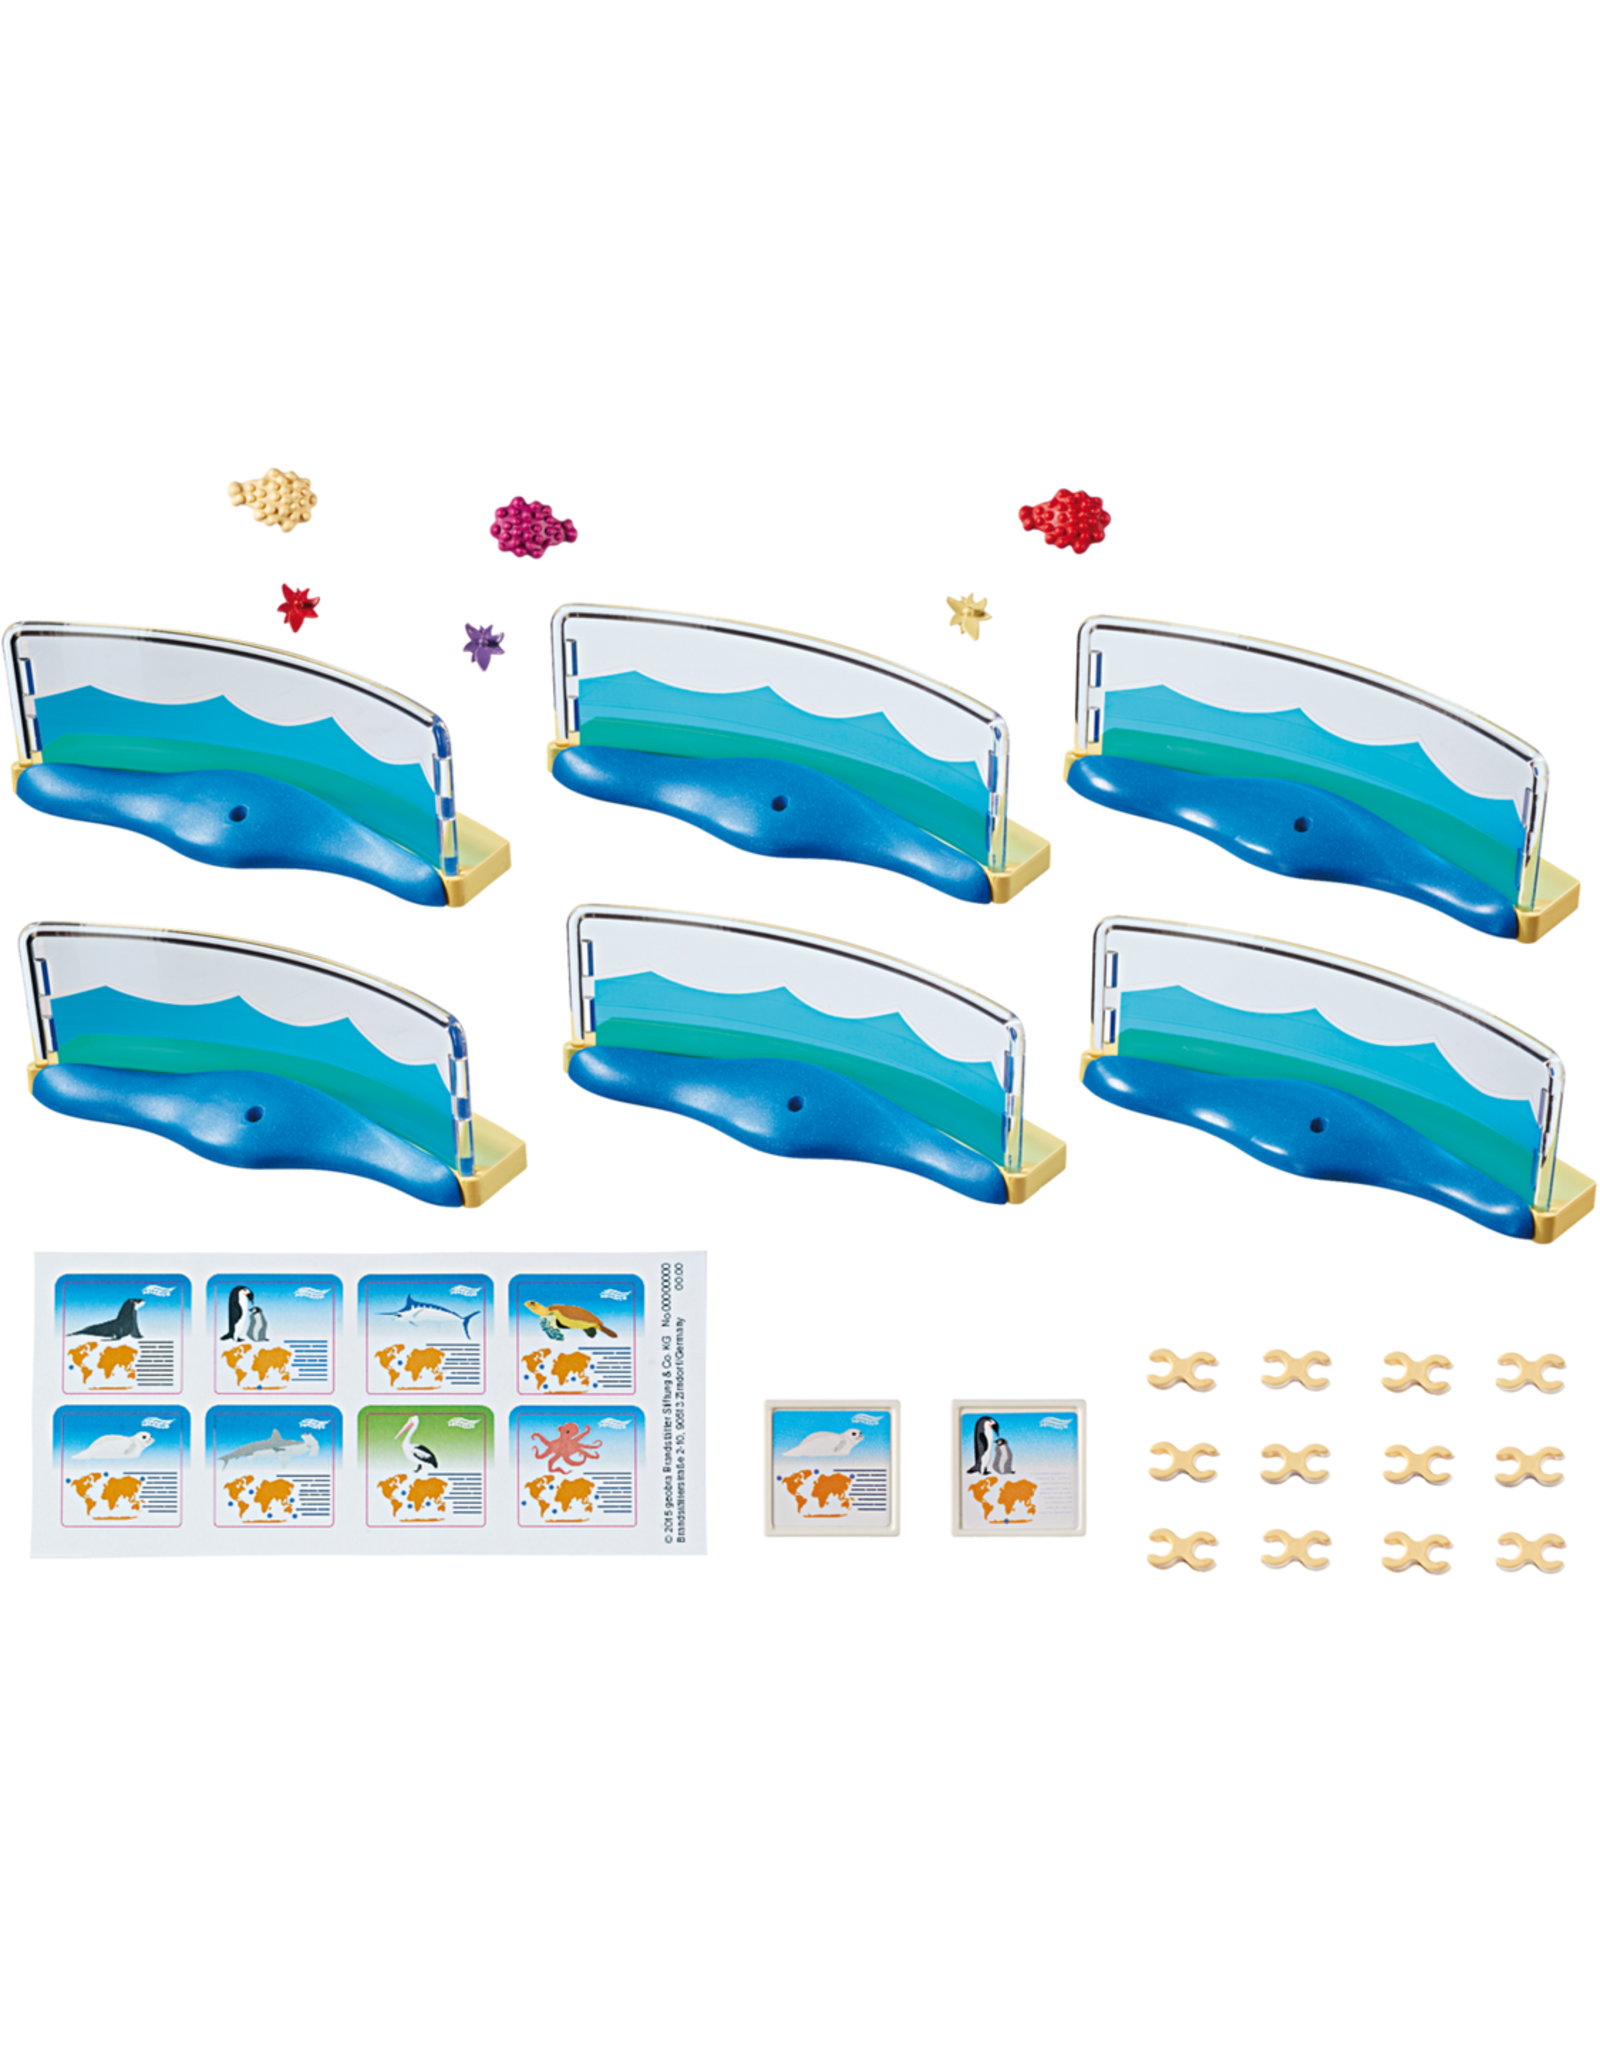 Playmobil Playmobil Family Fun 9063 Aquarium Enclosure